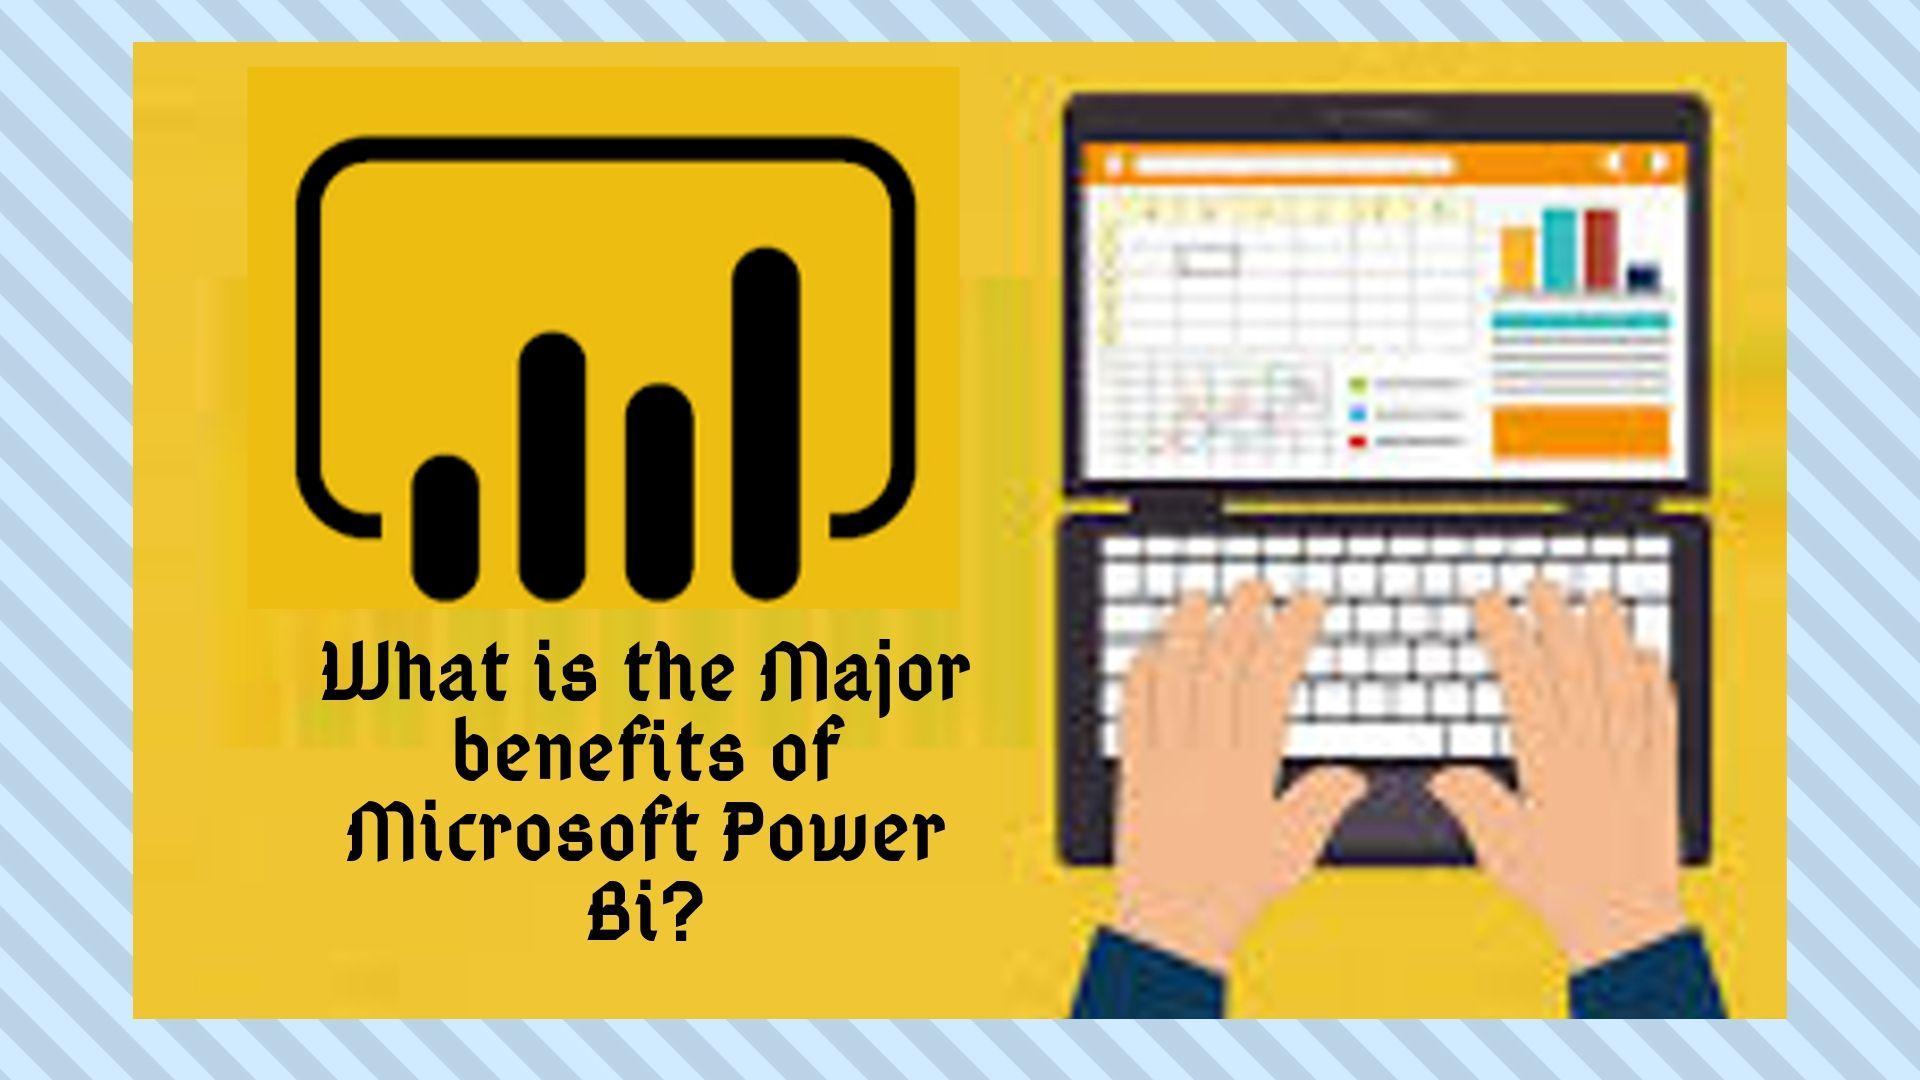 Superior advantages of Microsoft power bi tool